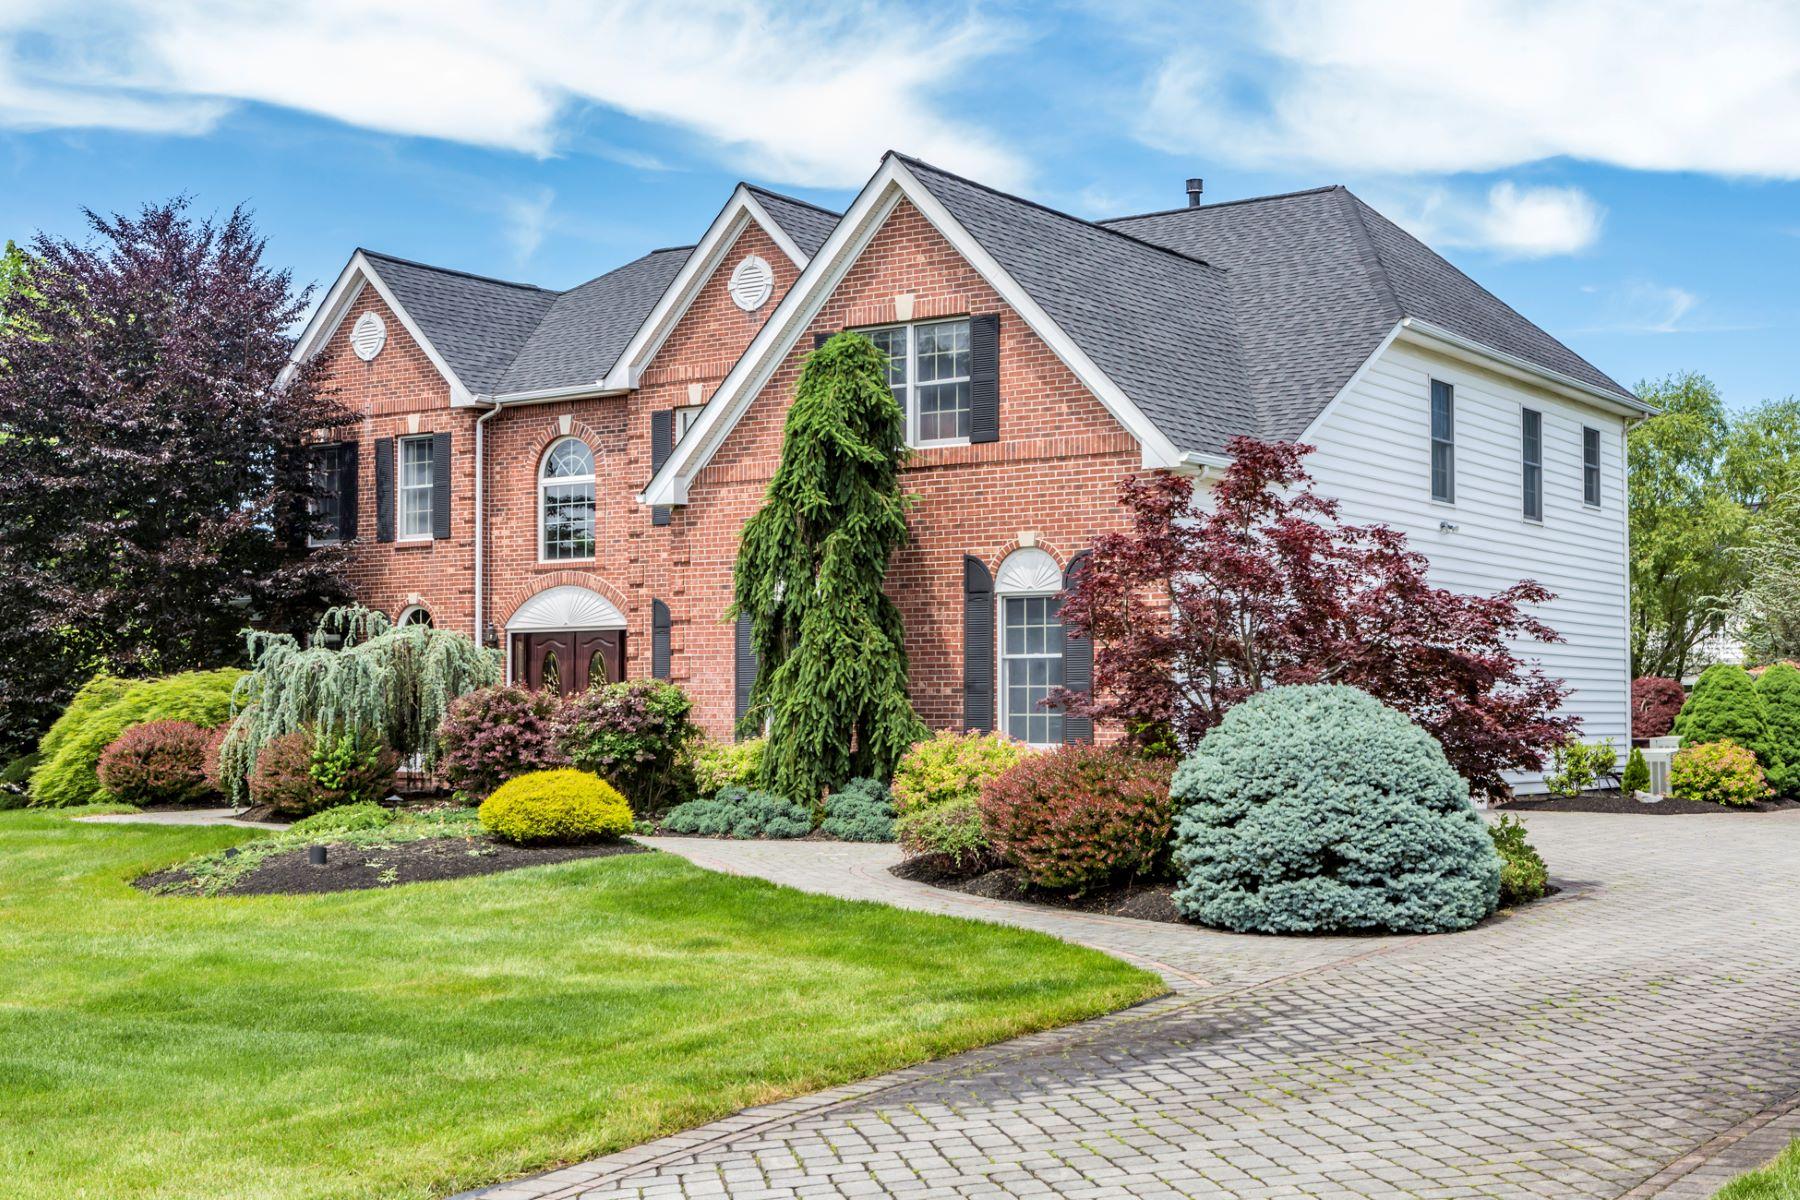 single family homes 为 销售 在 Serenely Set In Hopewell Hunt! 42 Morris Drive, 普林斯顿, 新泽西州 08540 美国